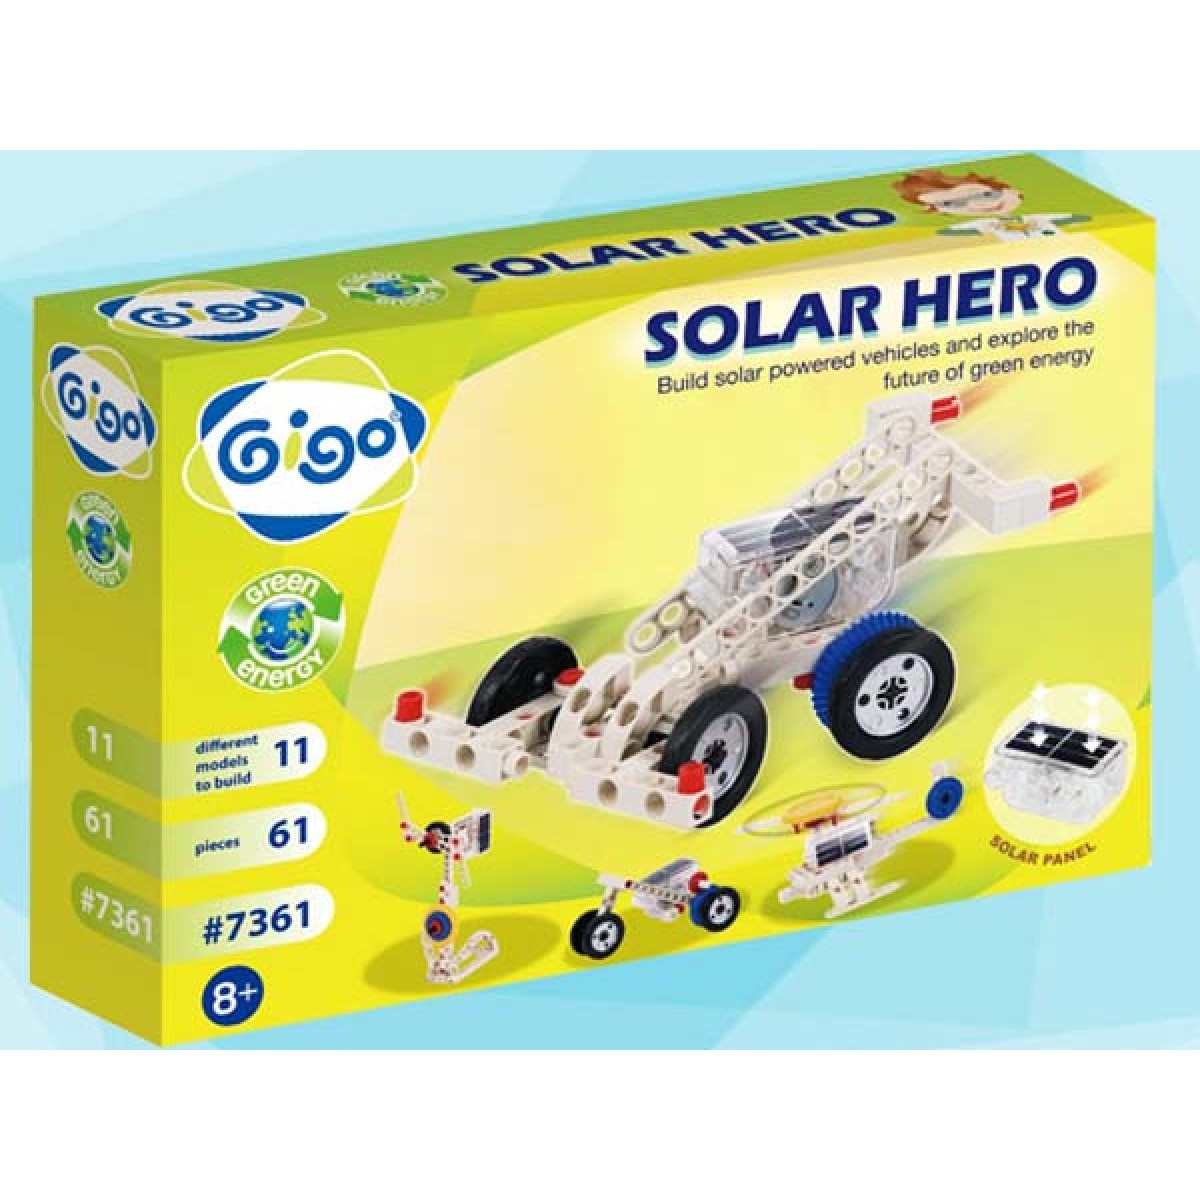 SOLAR HERO